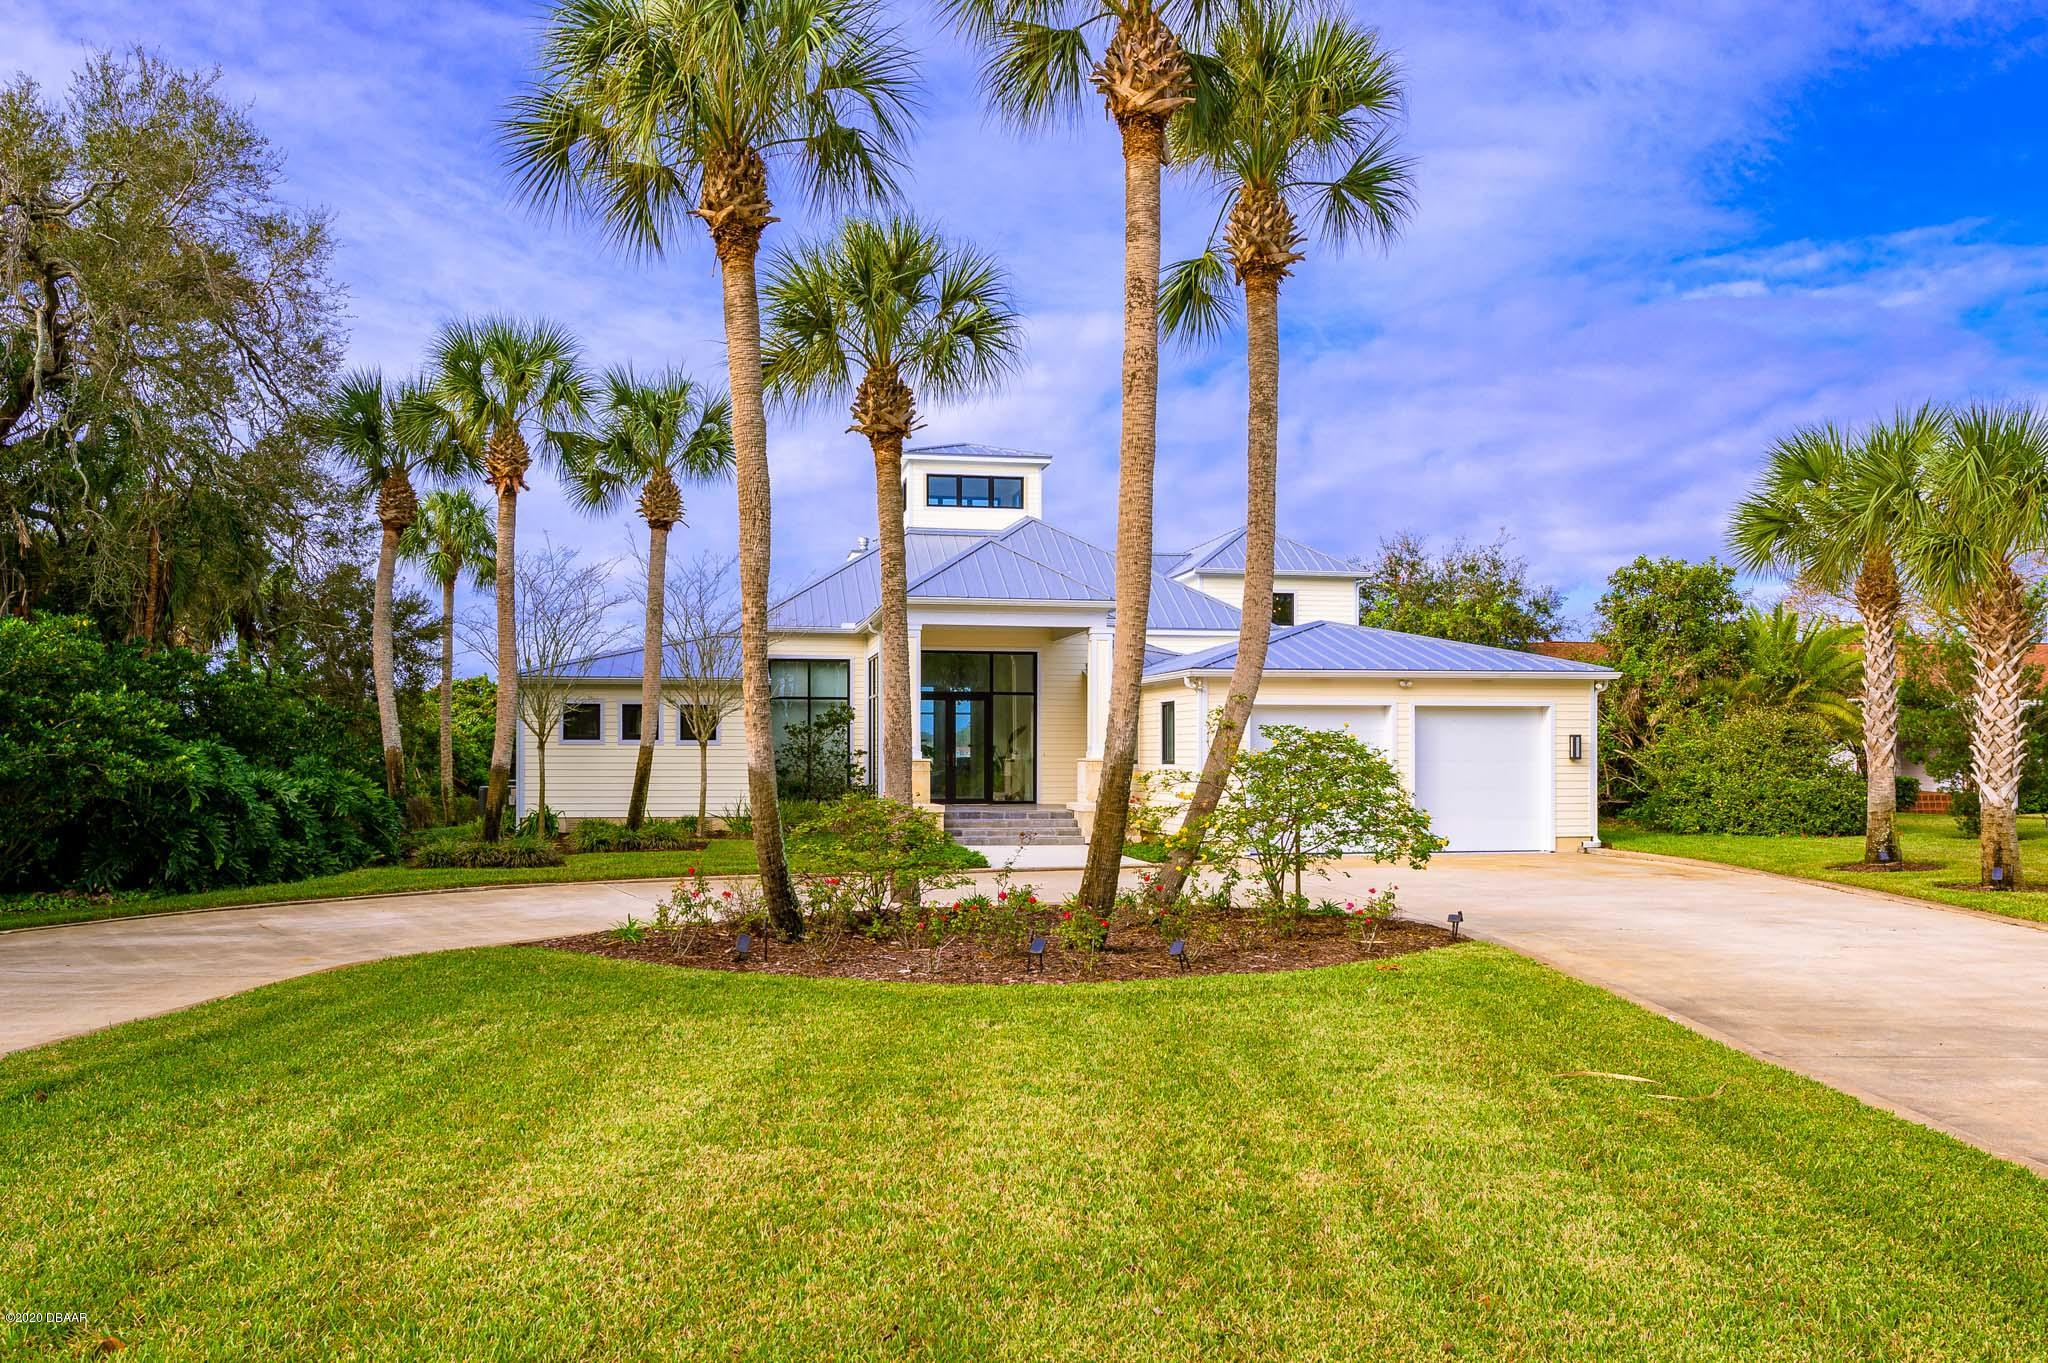 Photo of 200 John Anderson Drive, Ormond Beach, FL 32176